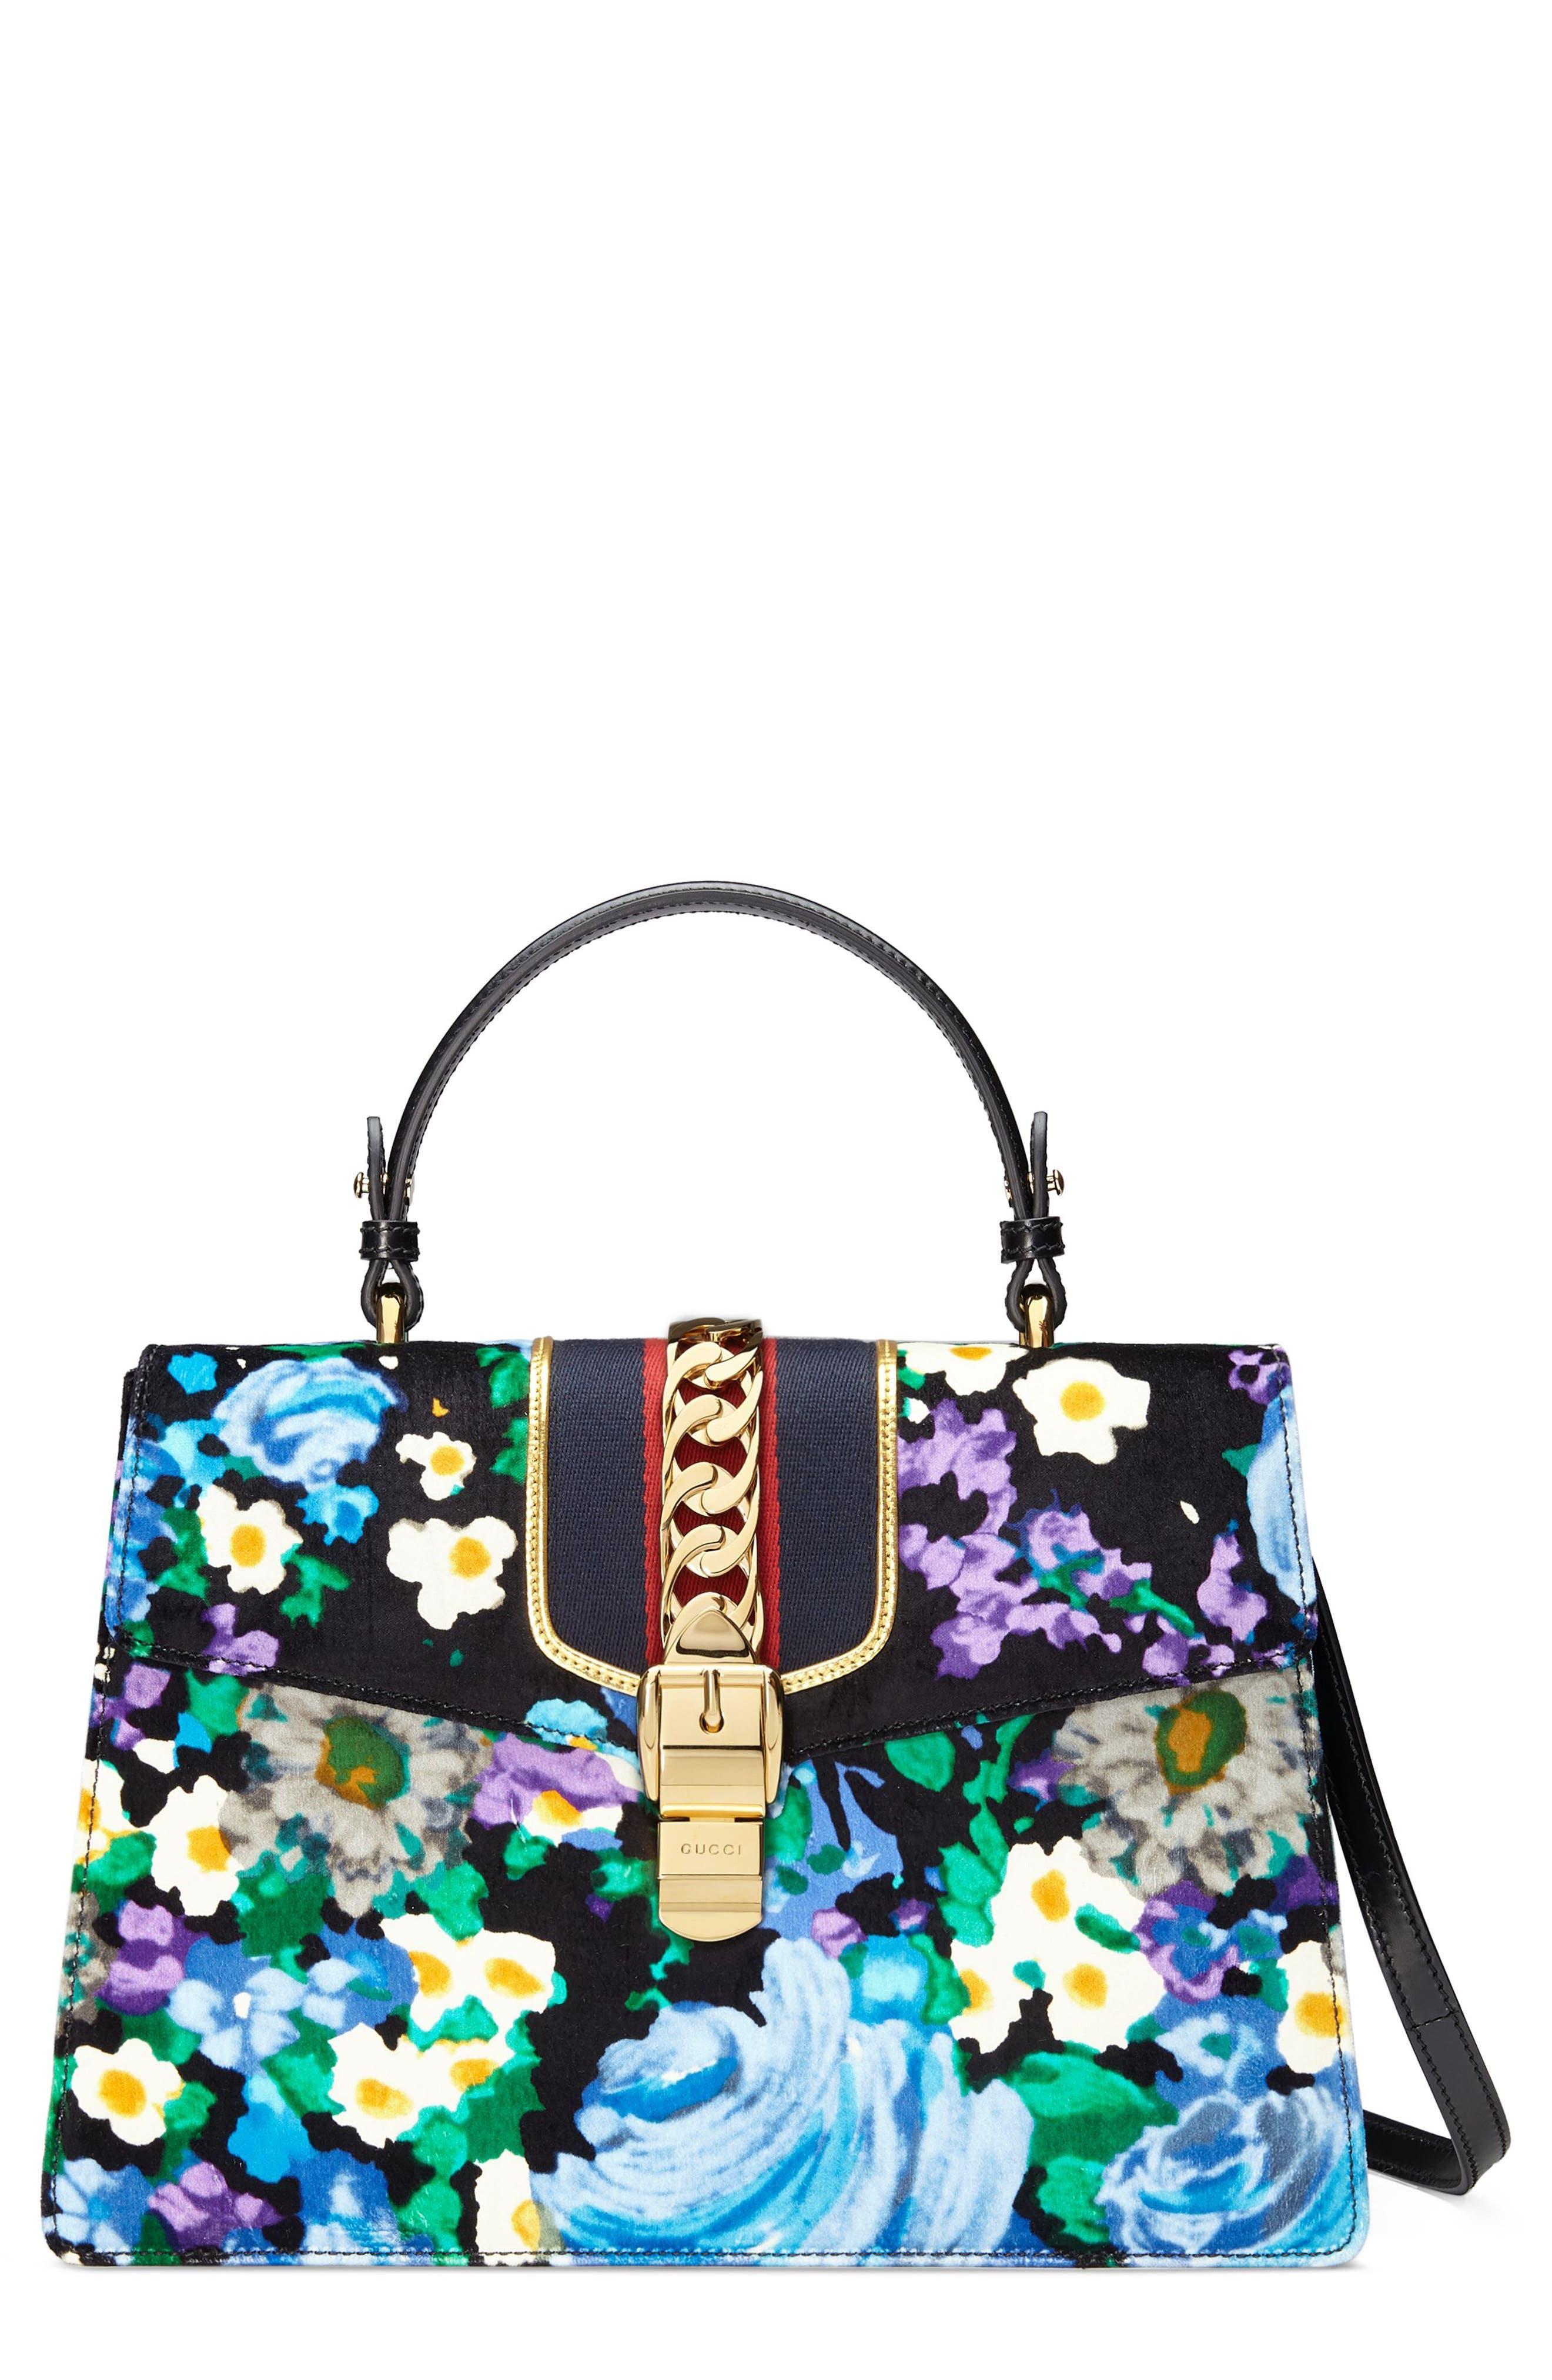 Gucci Medium Sylvie Floral Top Handle Velvet Shoulder Bag